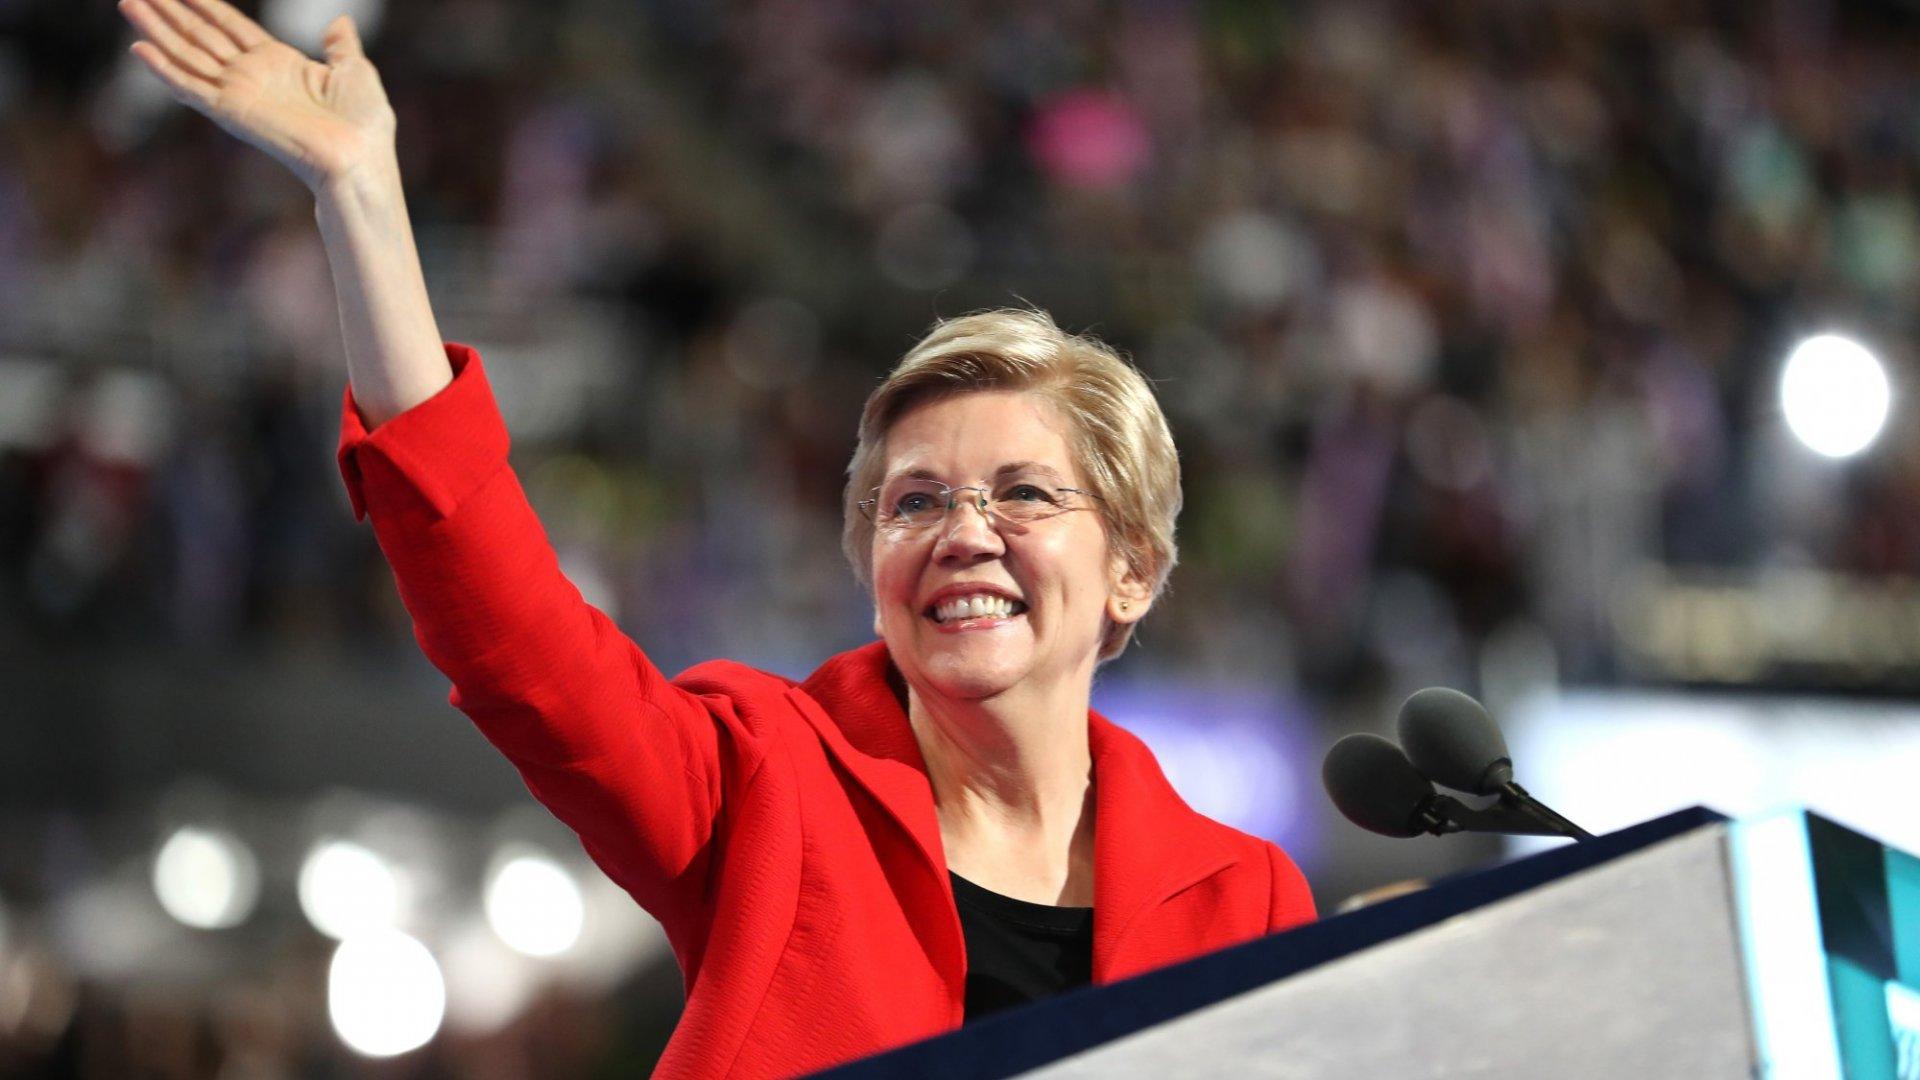 Elizabeth Warren's 3 Tips for the Next Generation of Business Leaders